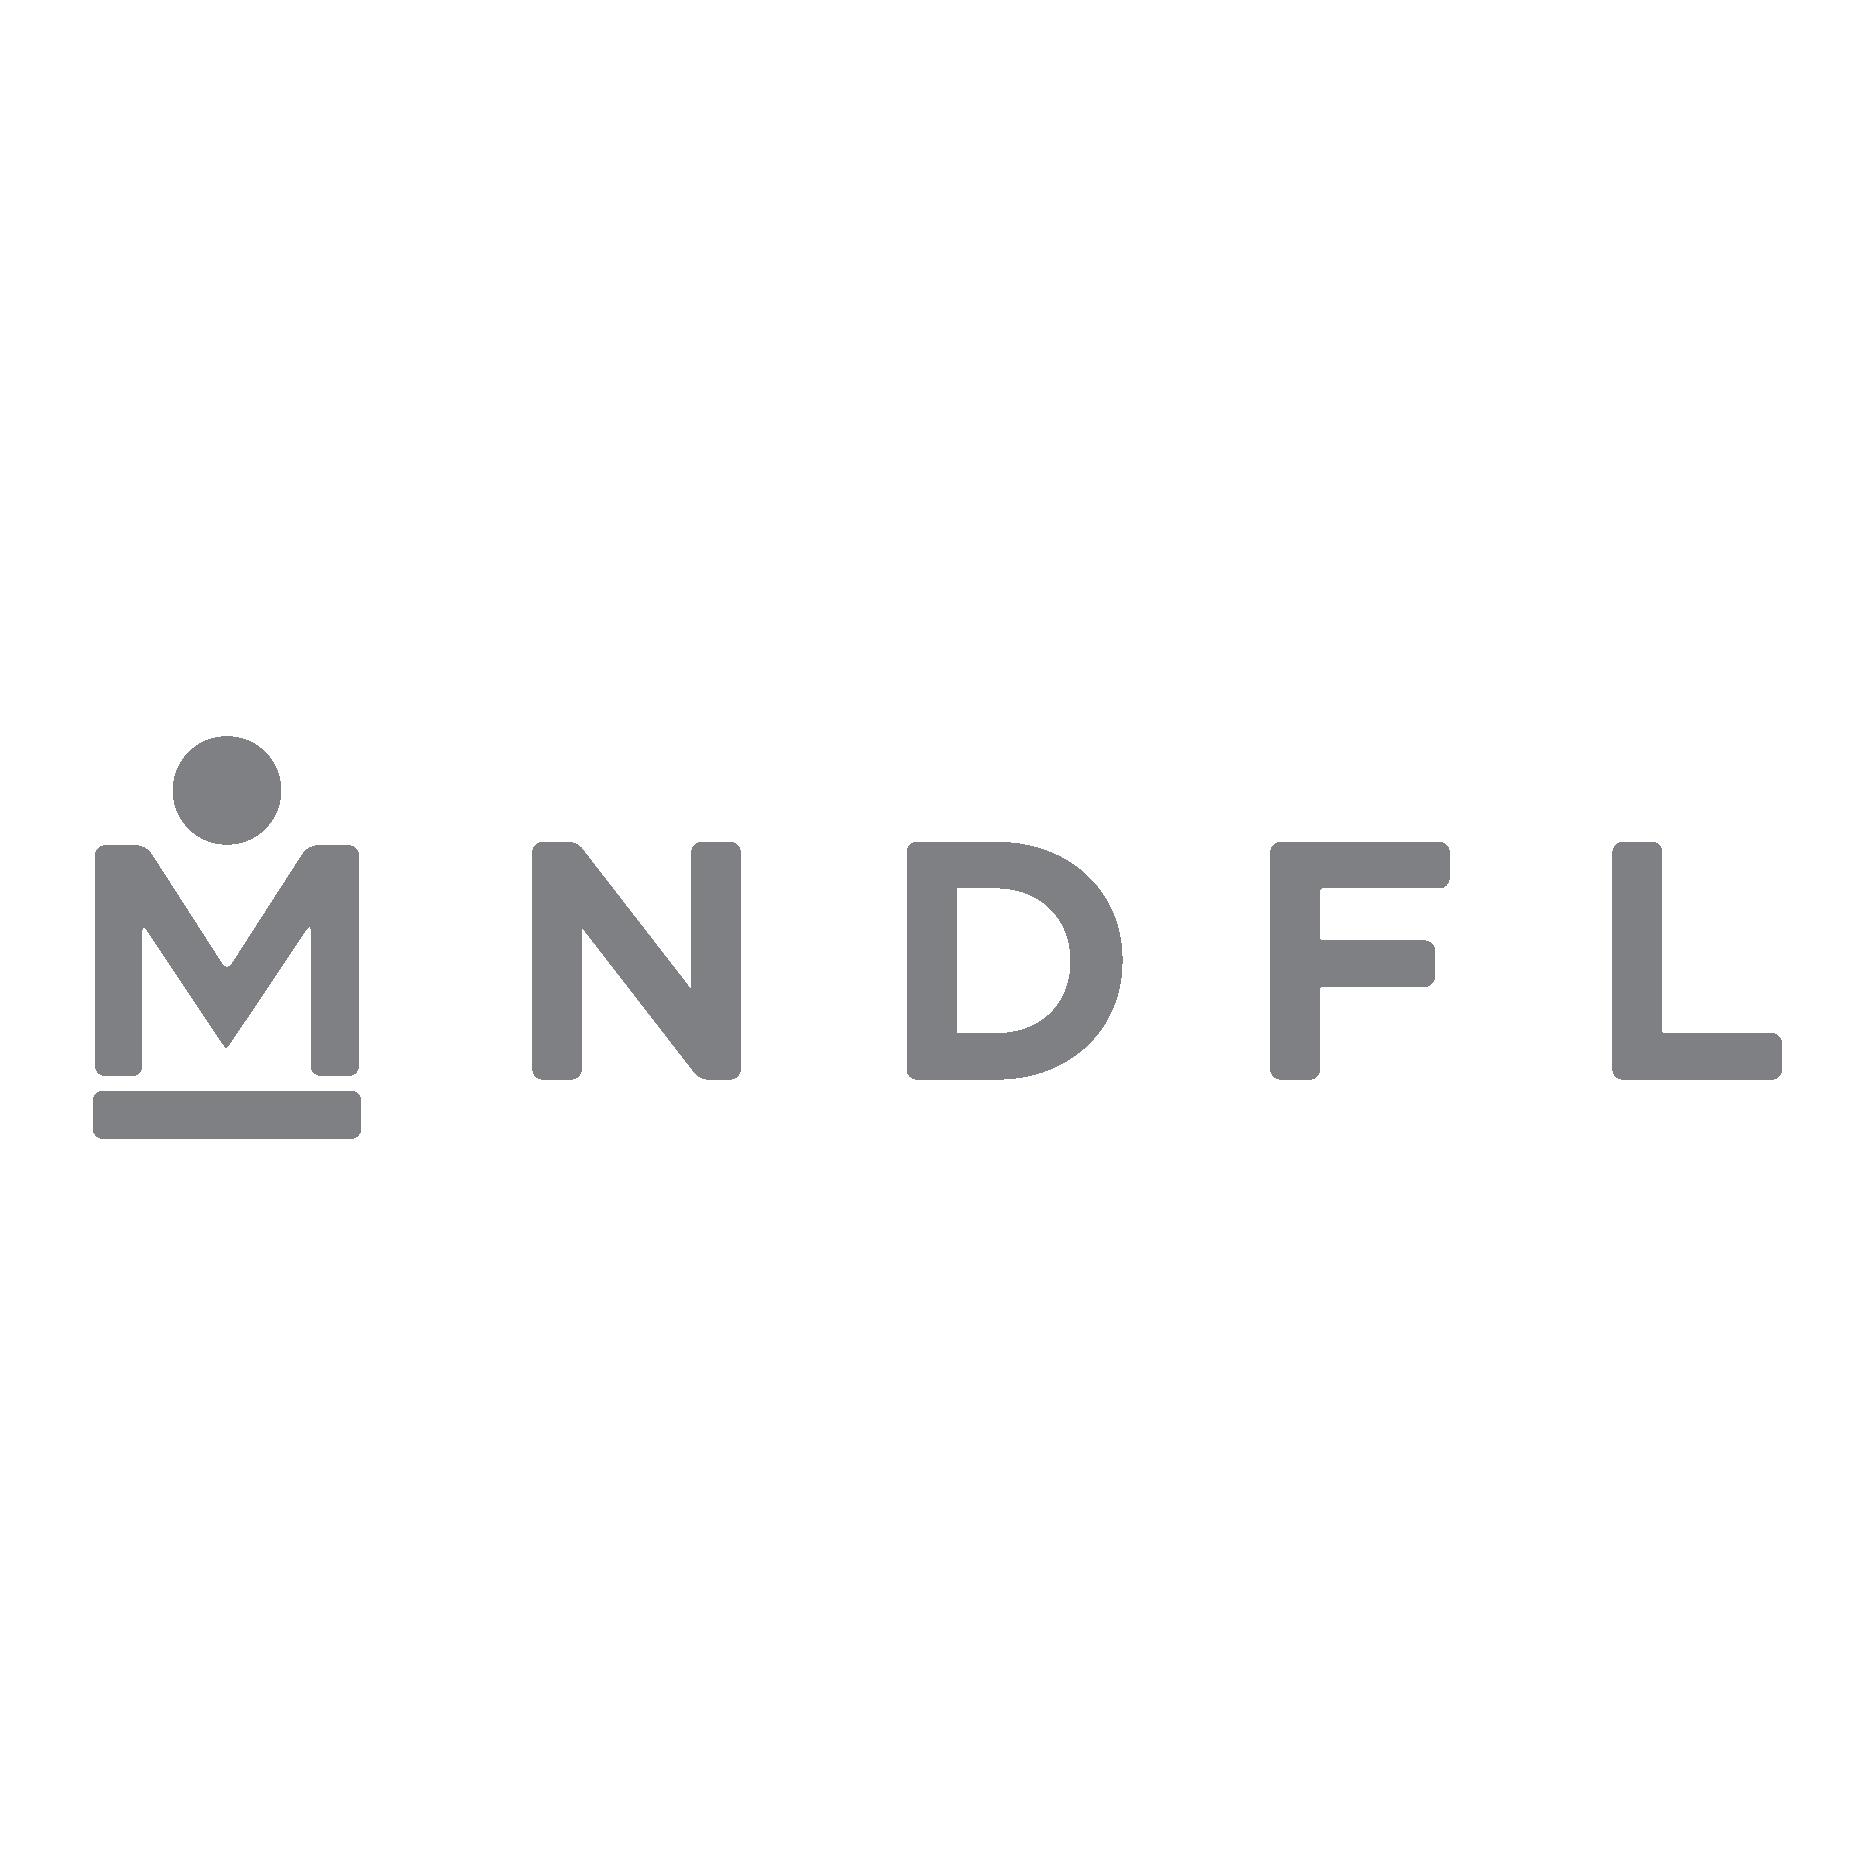 MNDFL_Logo_Tertiary_Charcoal.png